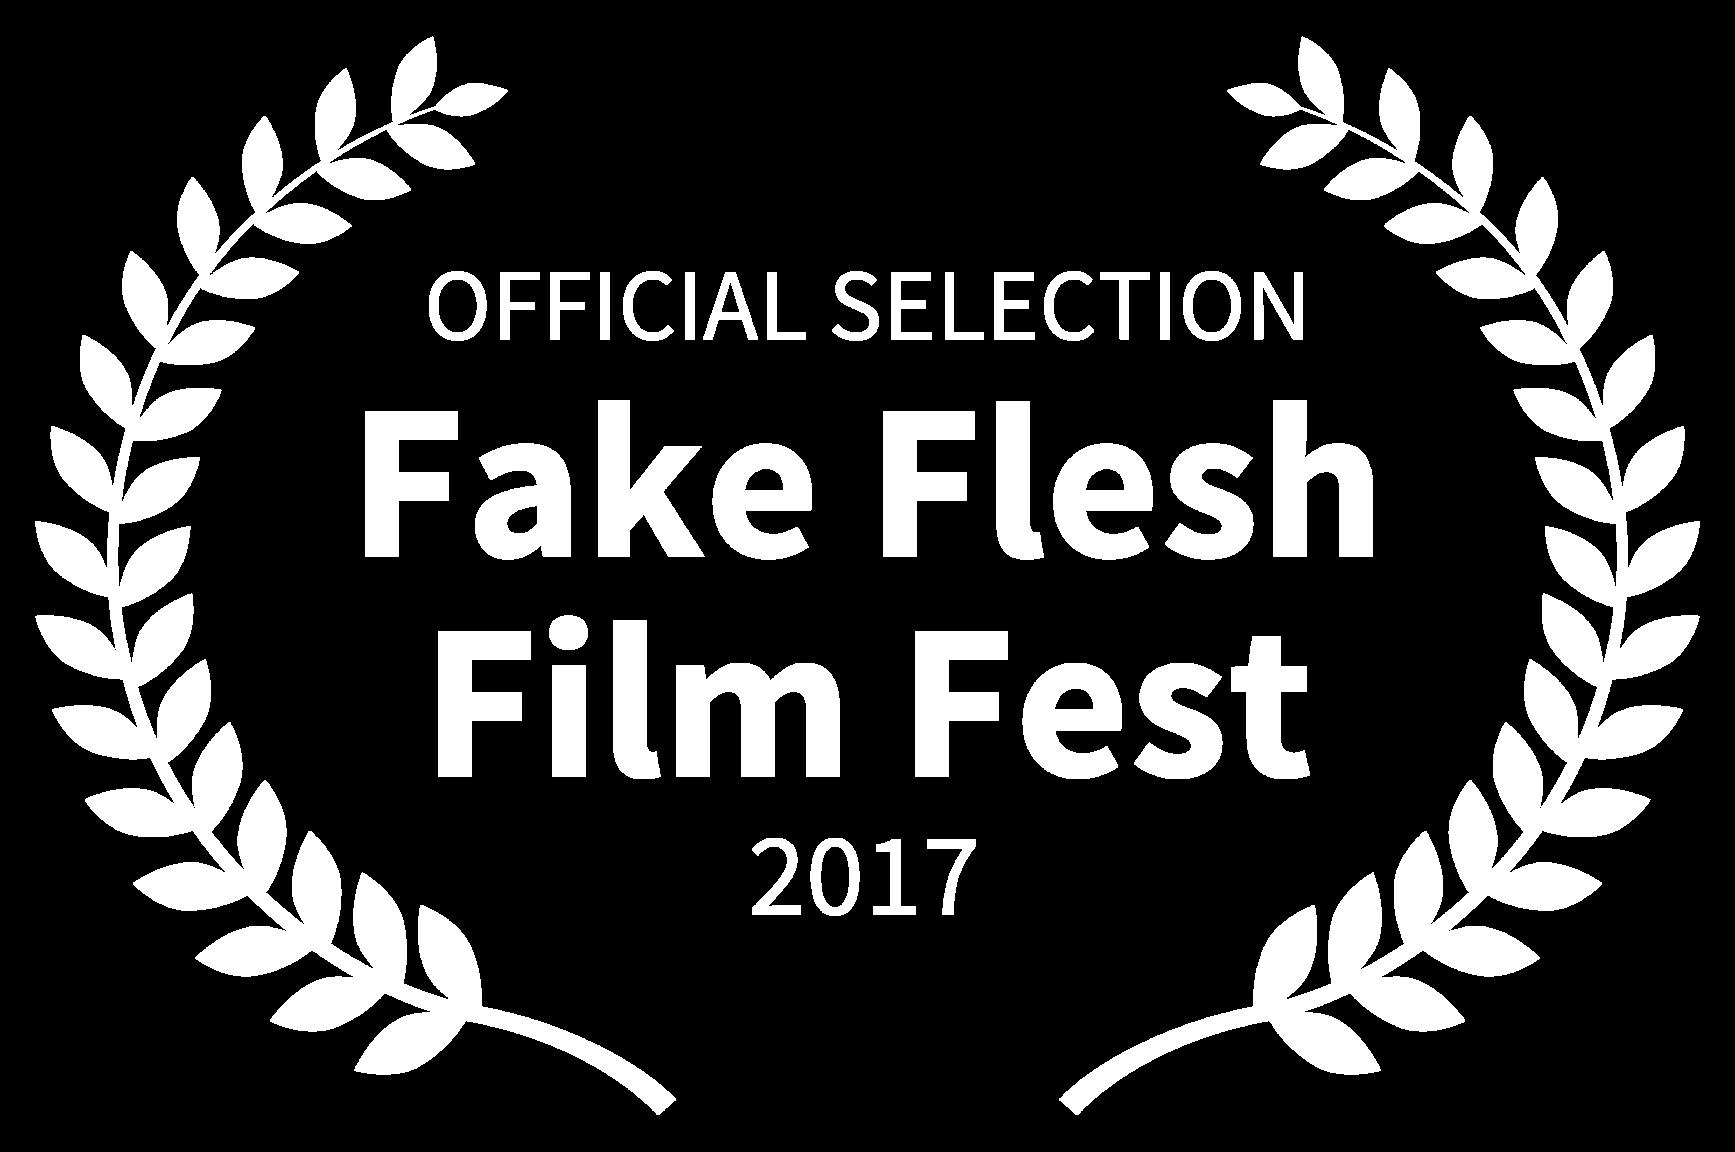 OFFICIAL SELECTION - Fake Flesh Film Fest - 2017 (1).png